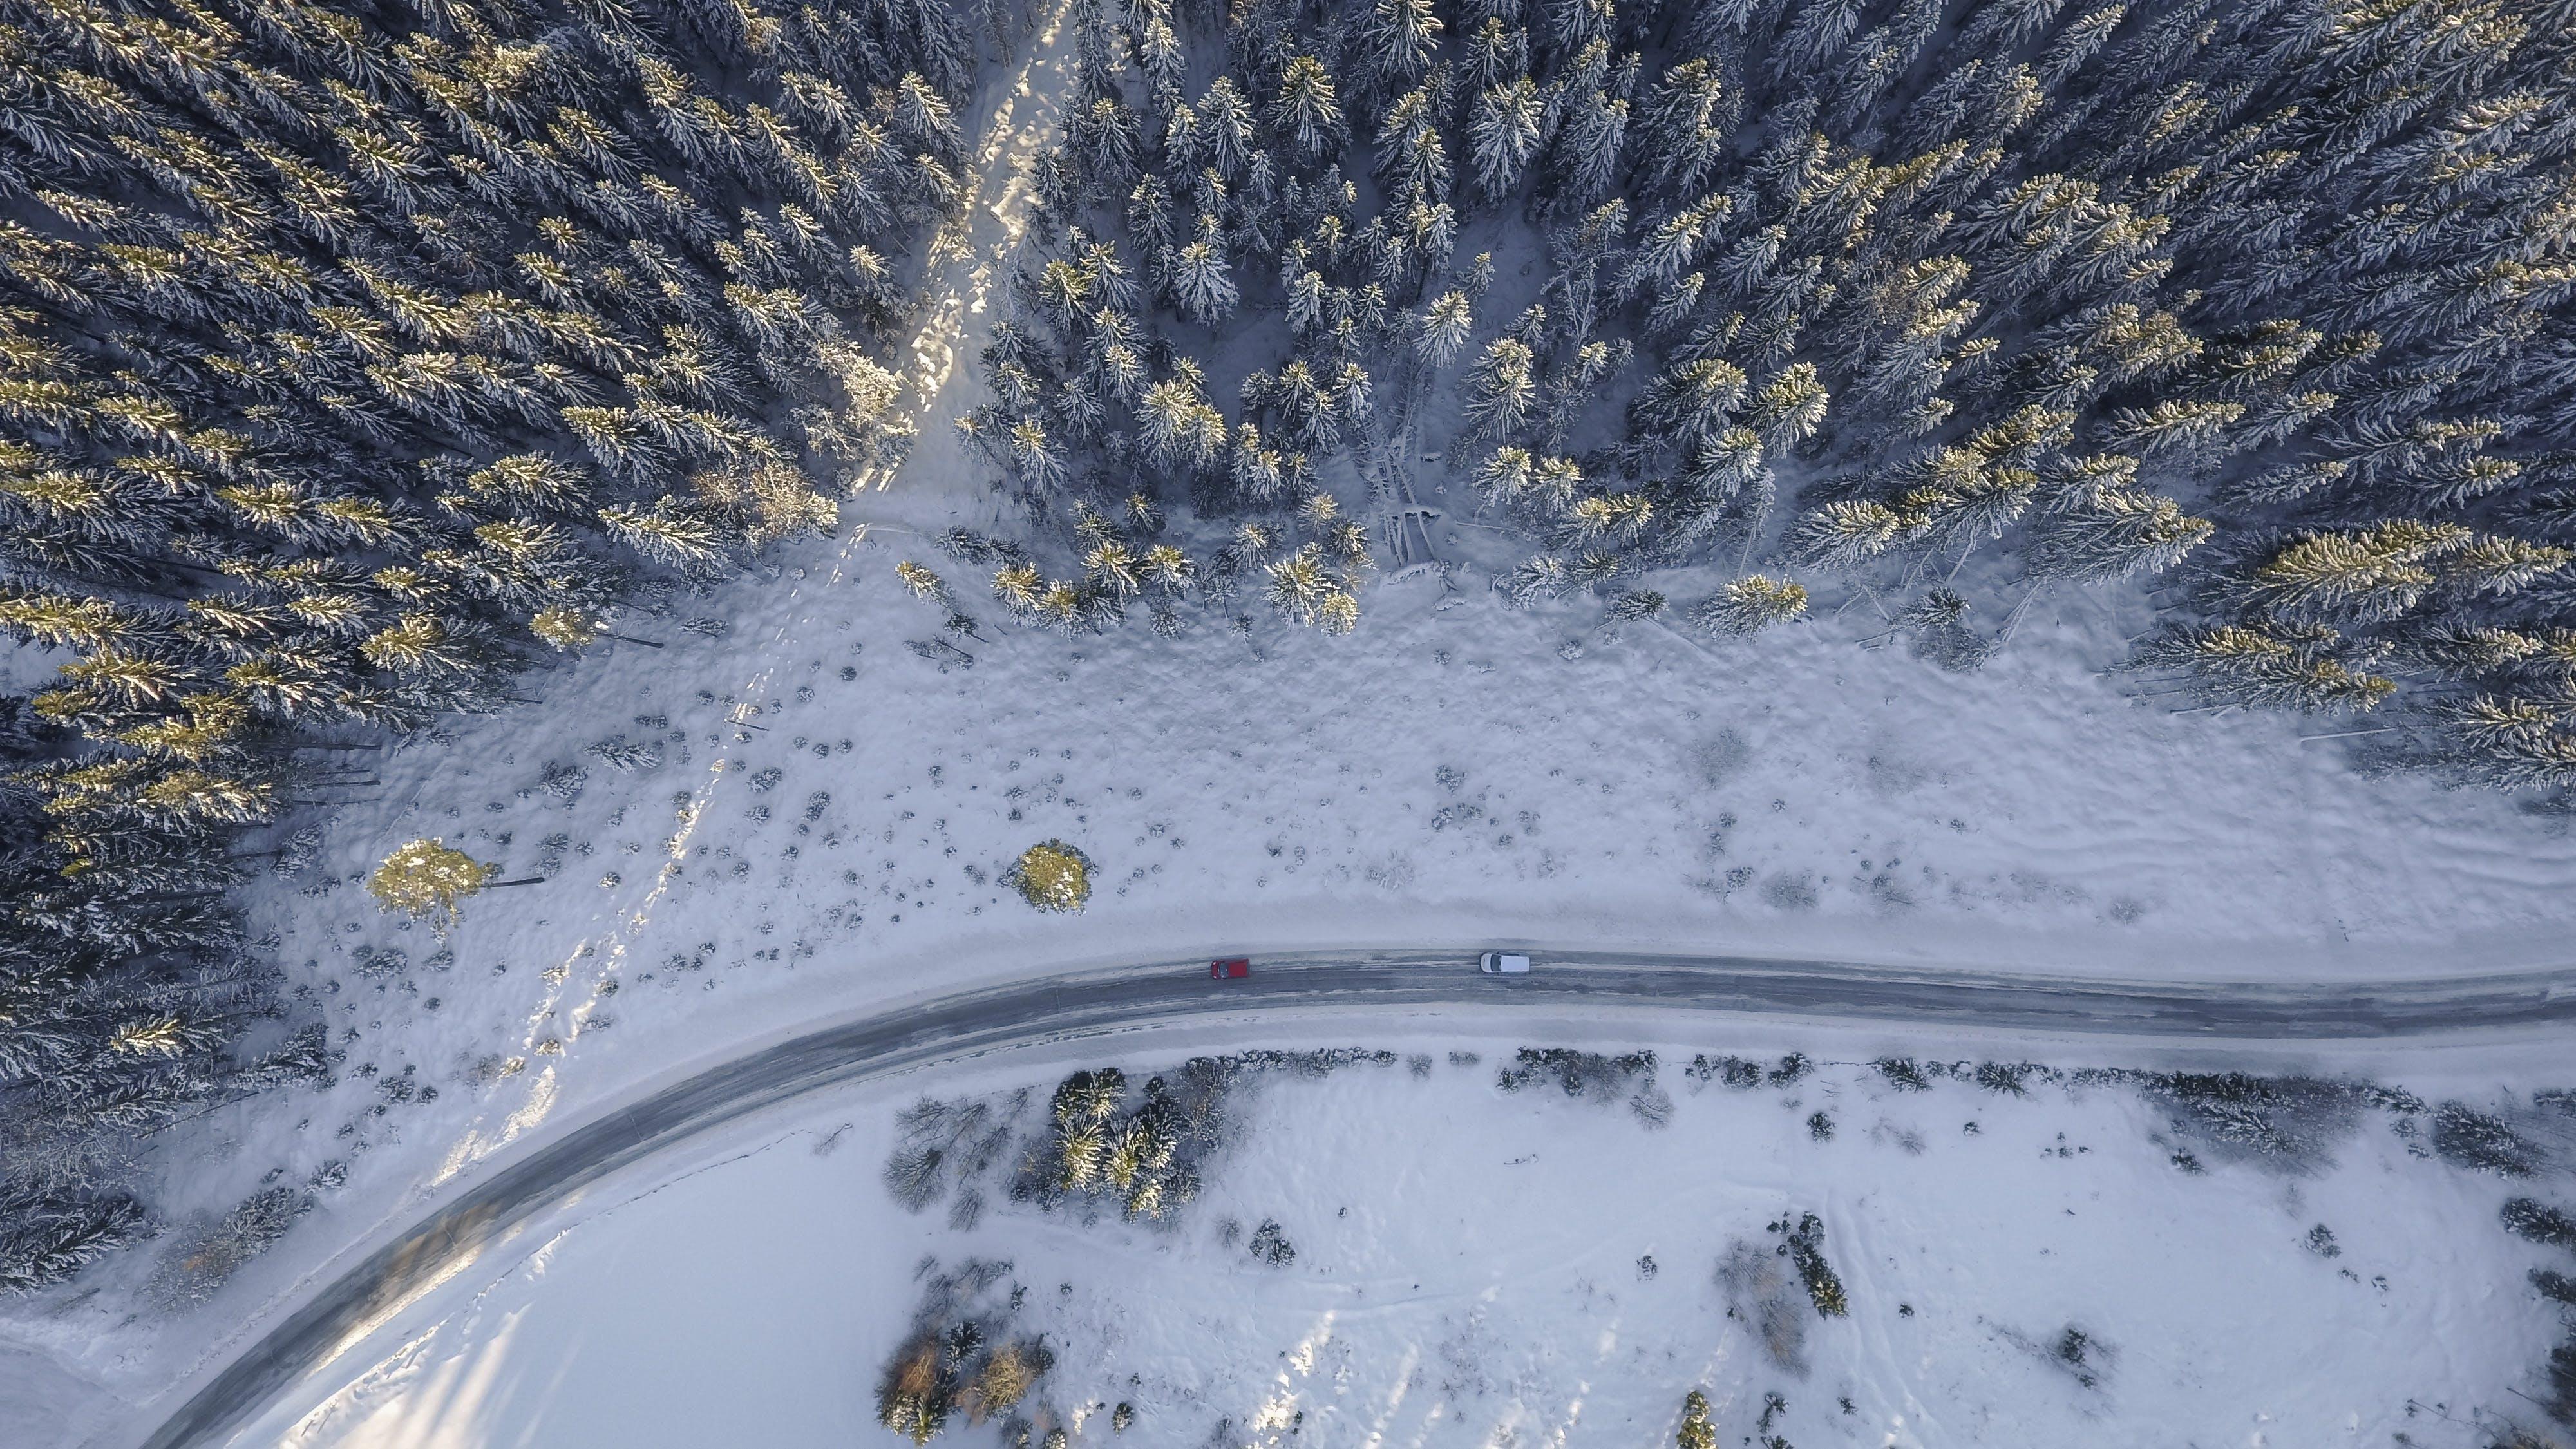 Kostenloses Stock Foto zu abenteuer, autos, bäume, eis